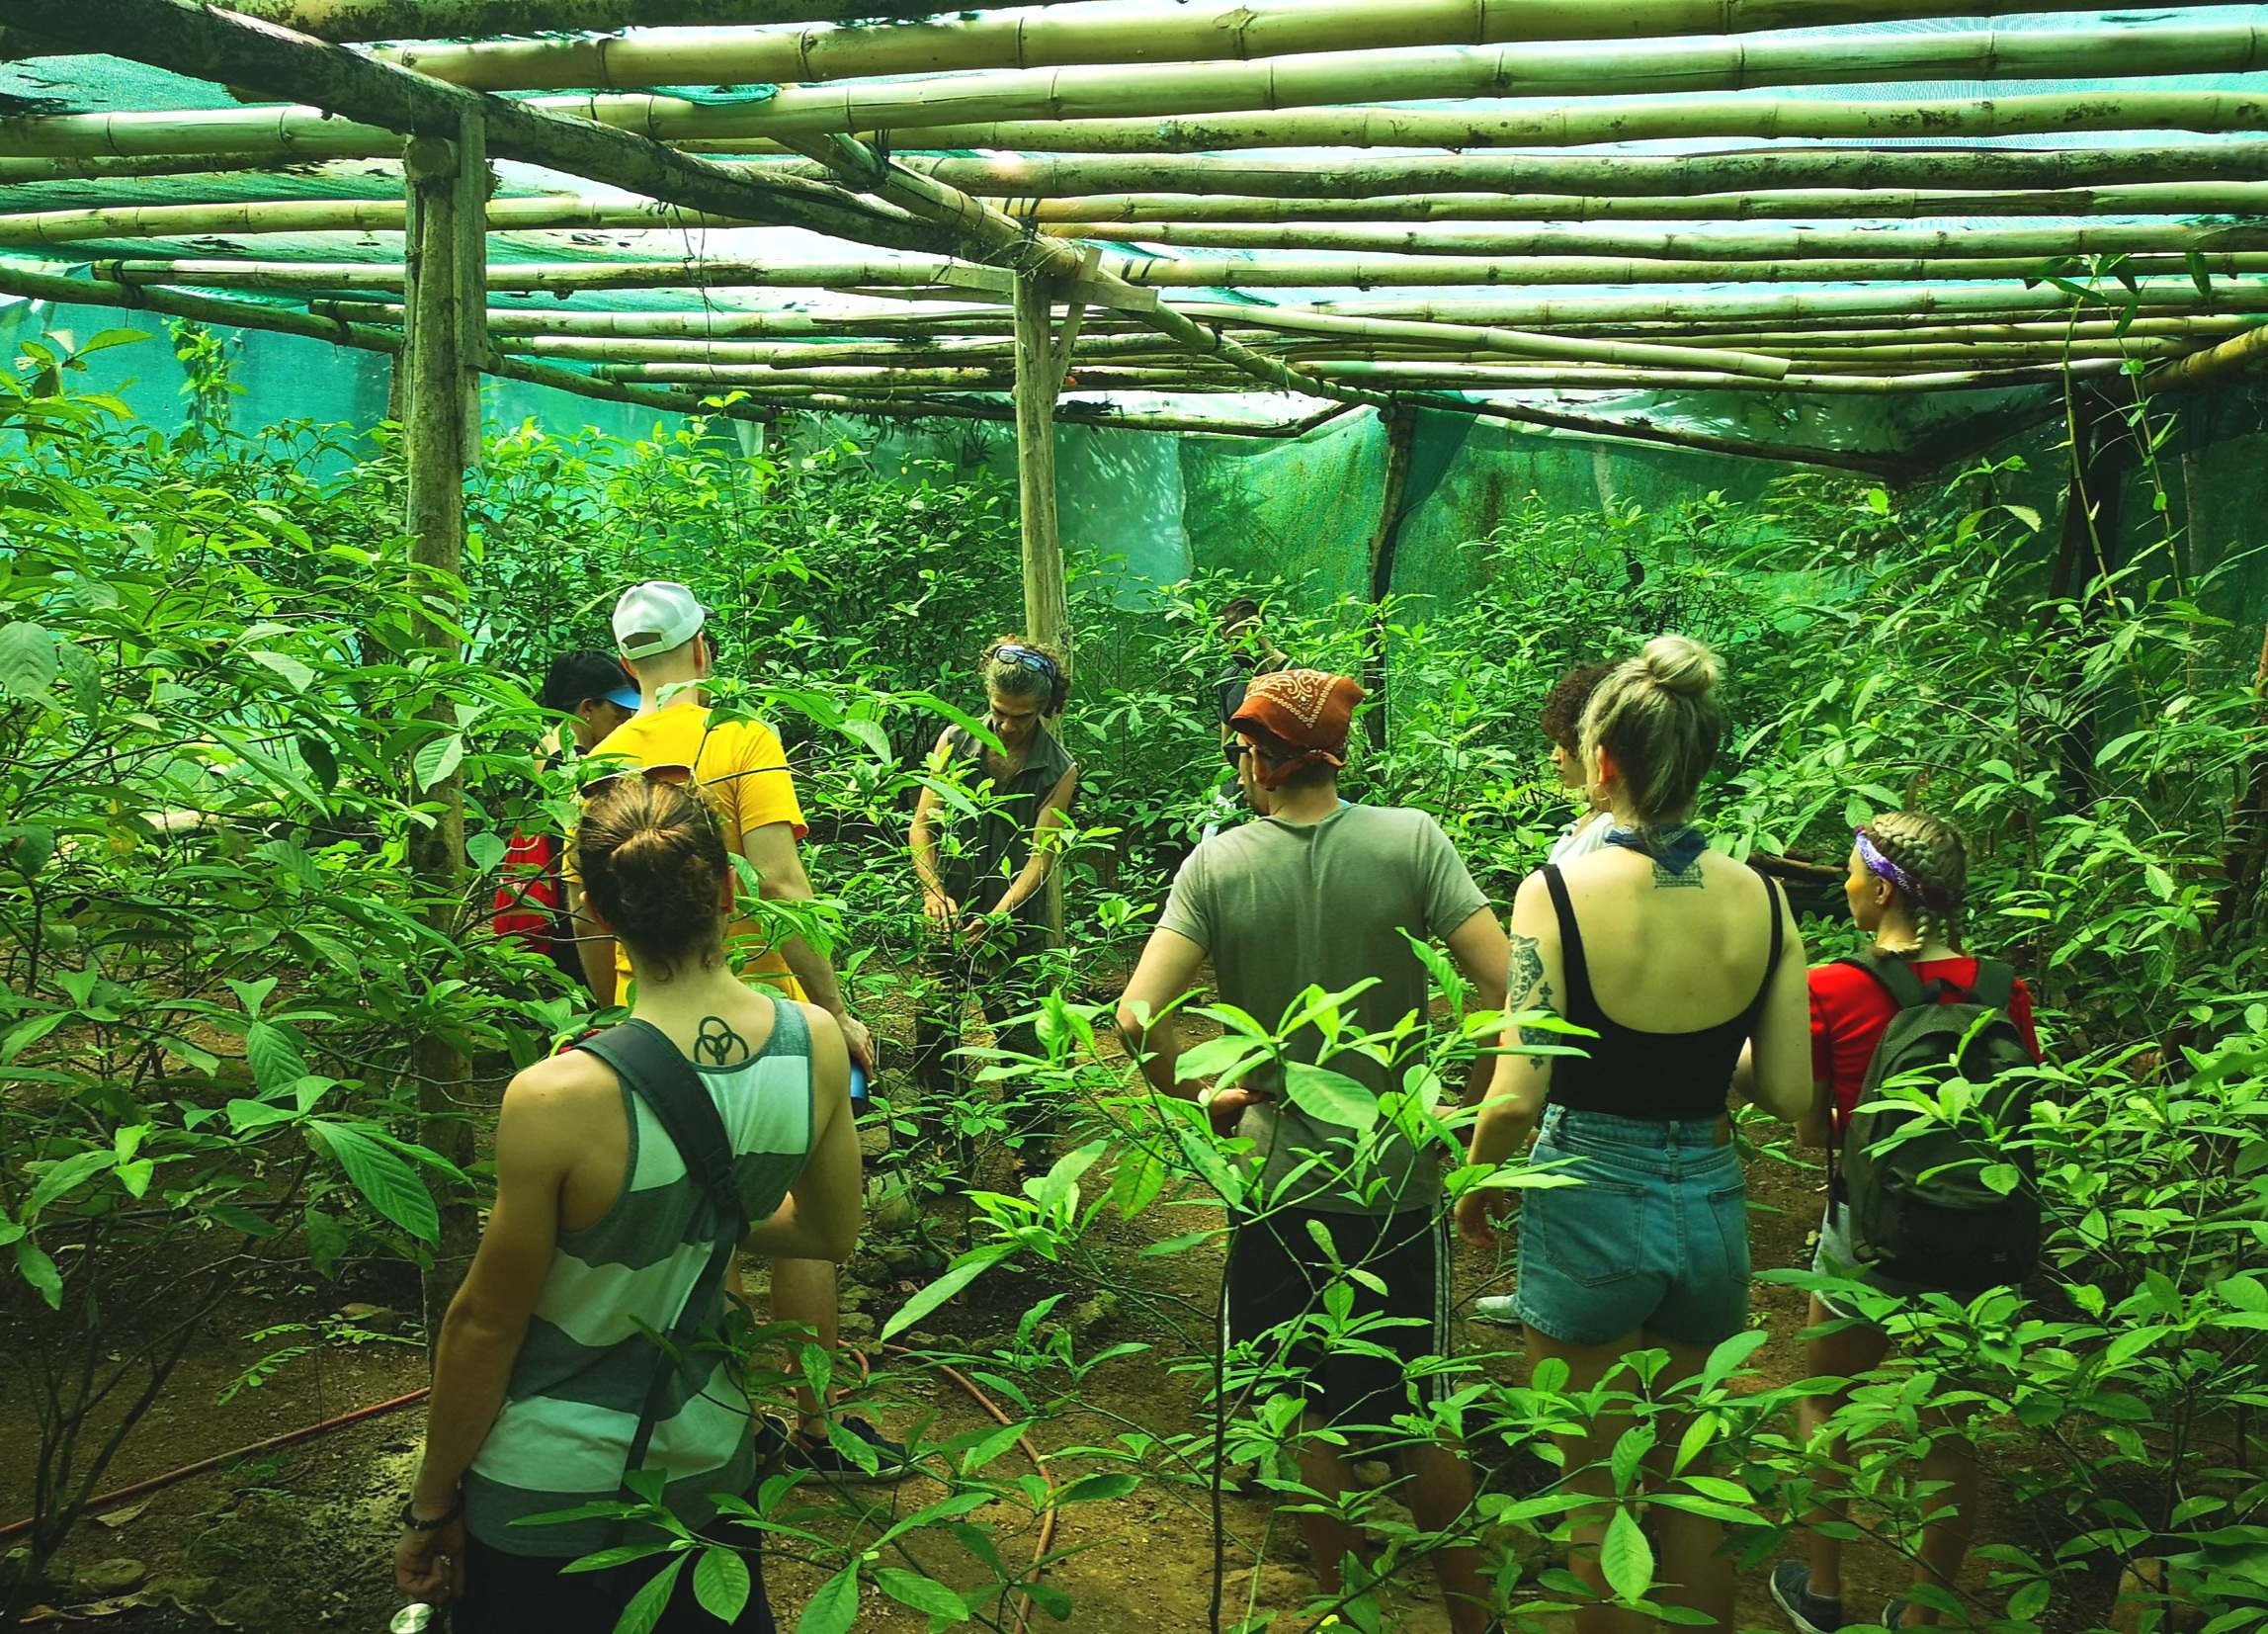 Tour of the Chacruna Greenhouses